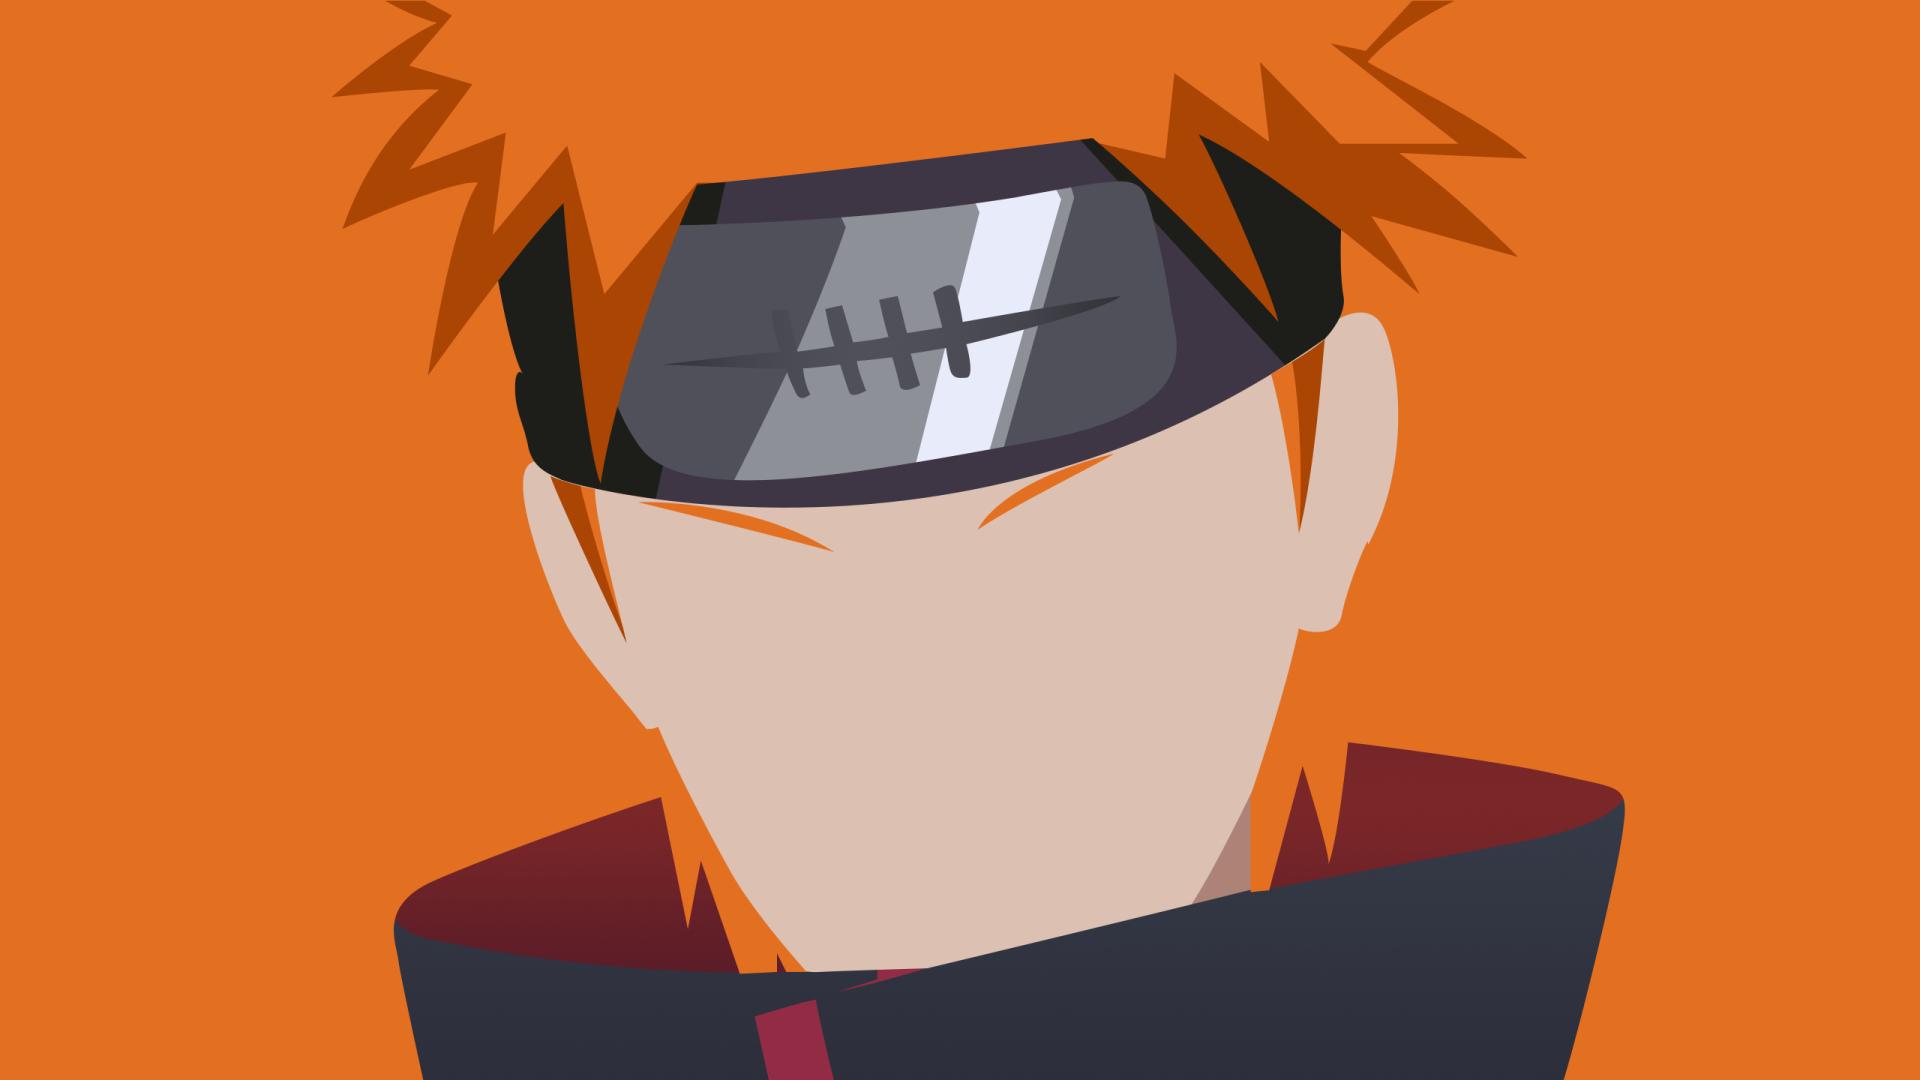 1920x1080 Pain Naruto 1080P Laptop Full HD Wallpaper, HD ...